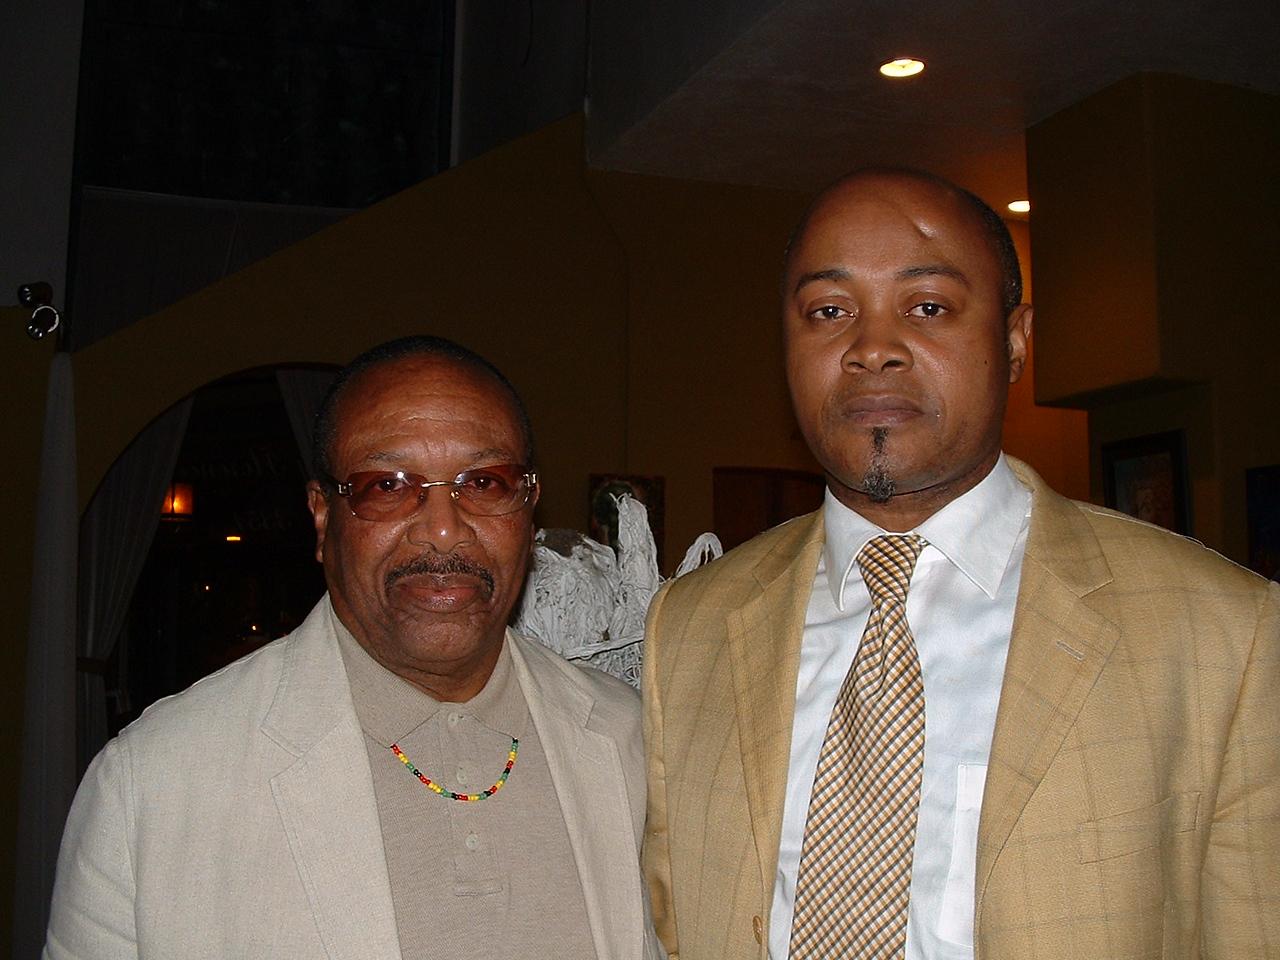 Dr. Kwaku and Guy Patrice Lumumba of Congo